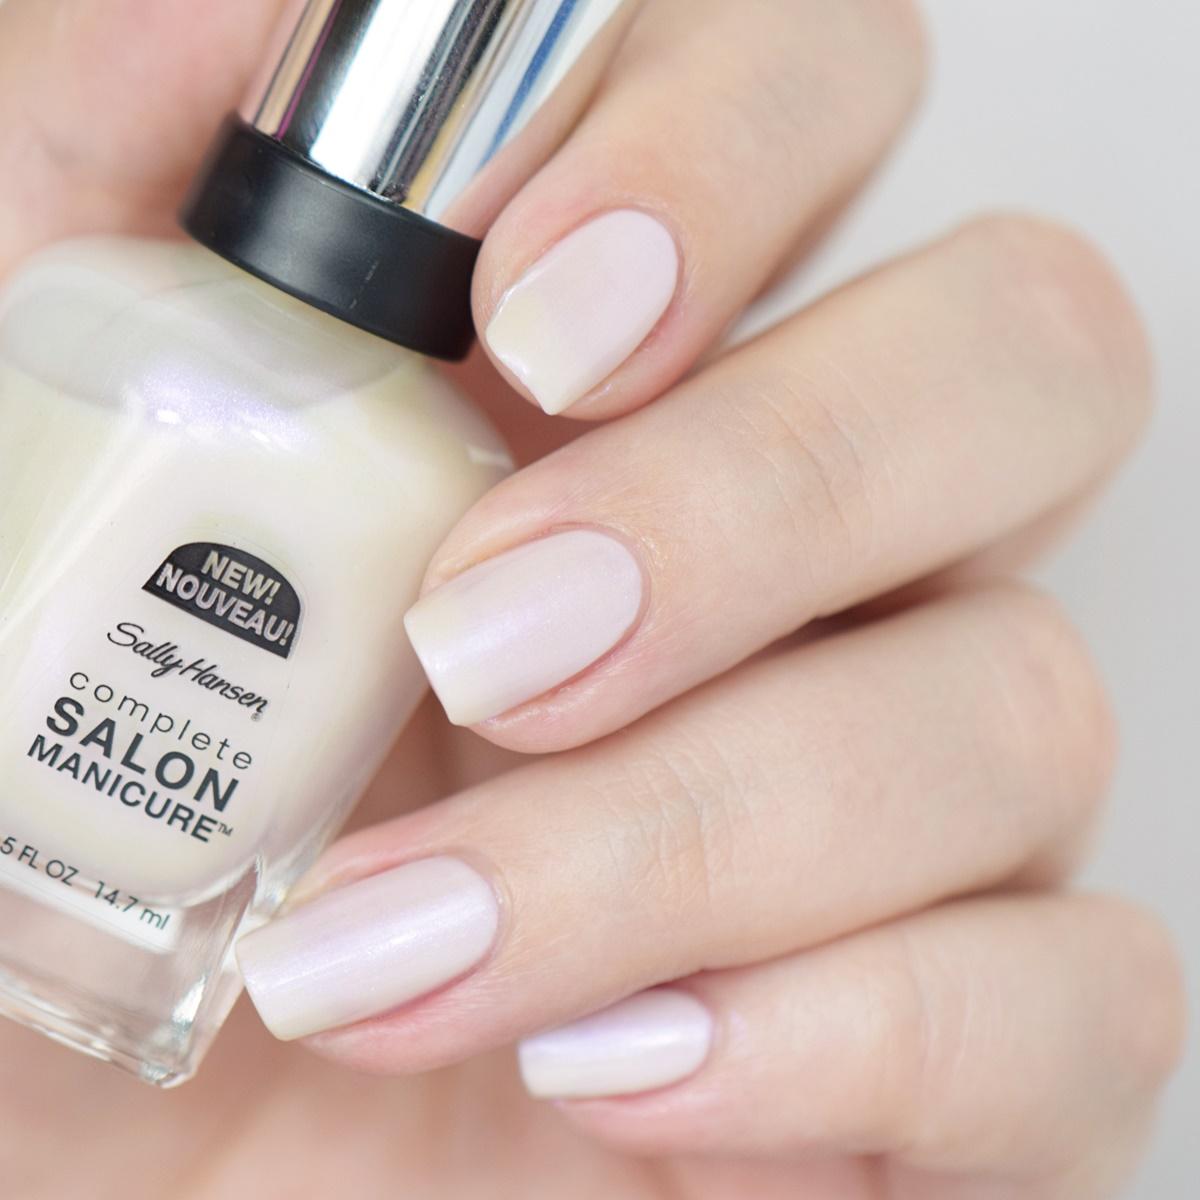 Sally Hansen Complete Salon Manicure 120 Luna Pearl